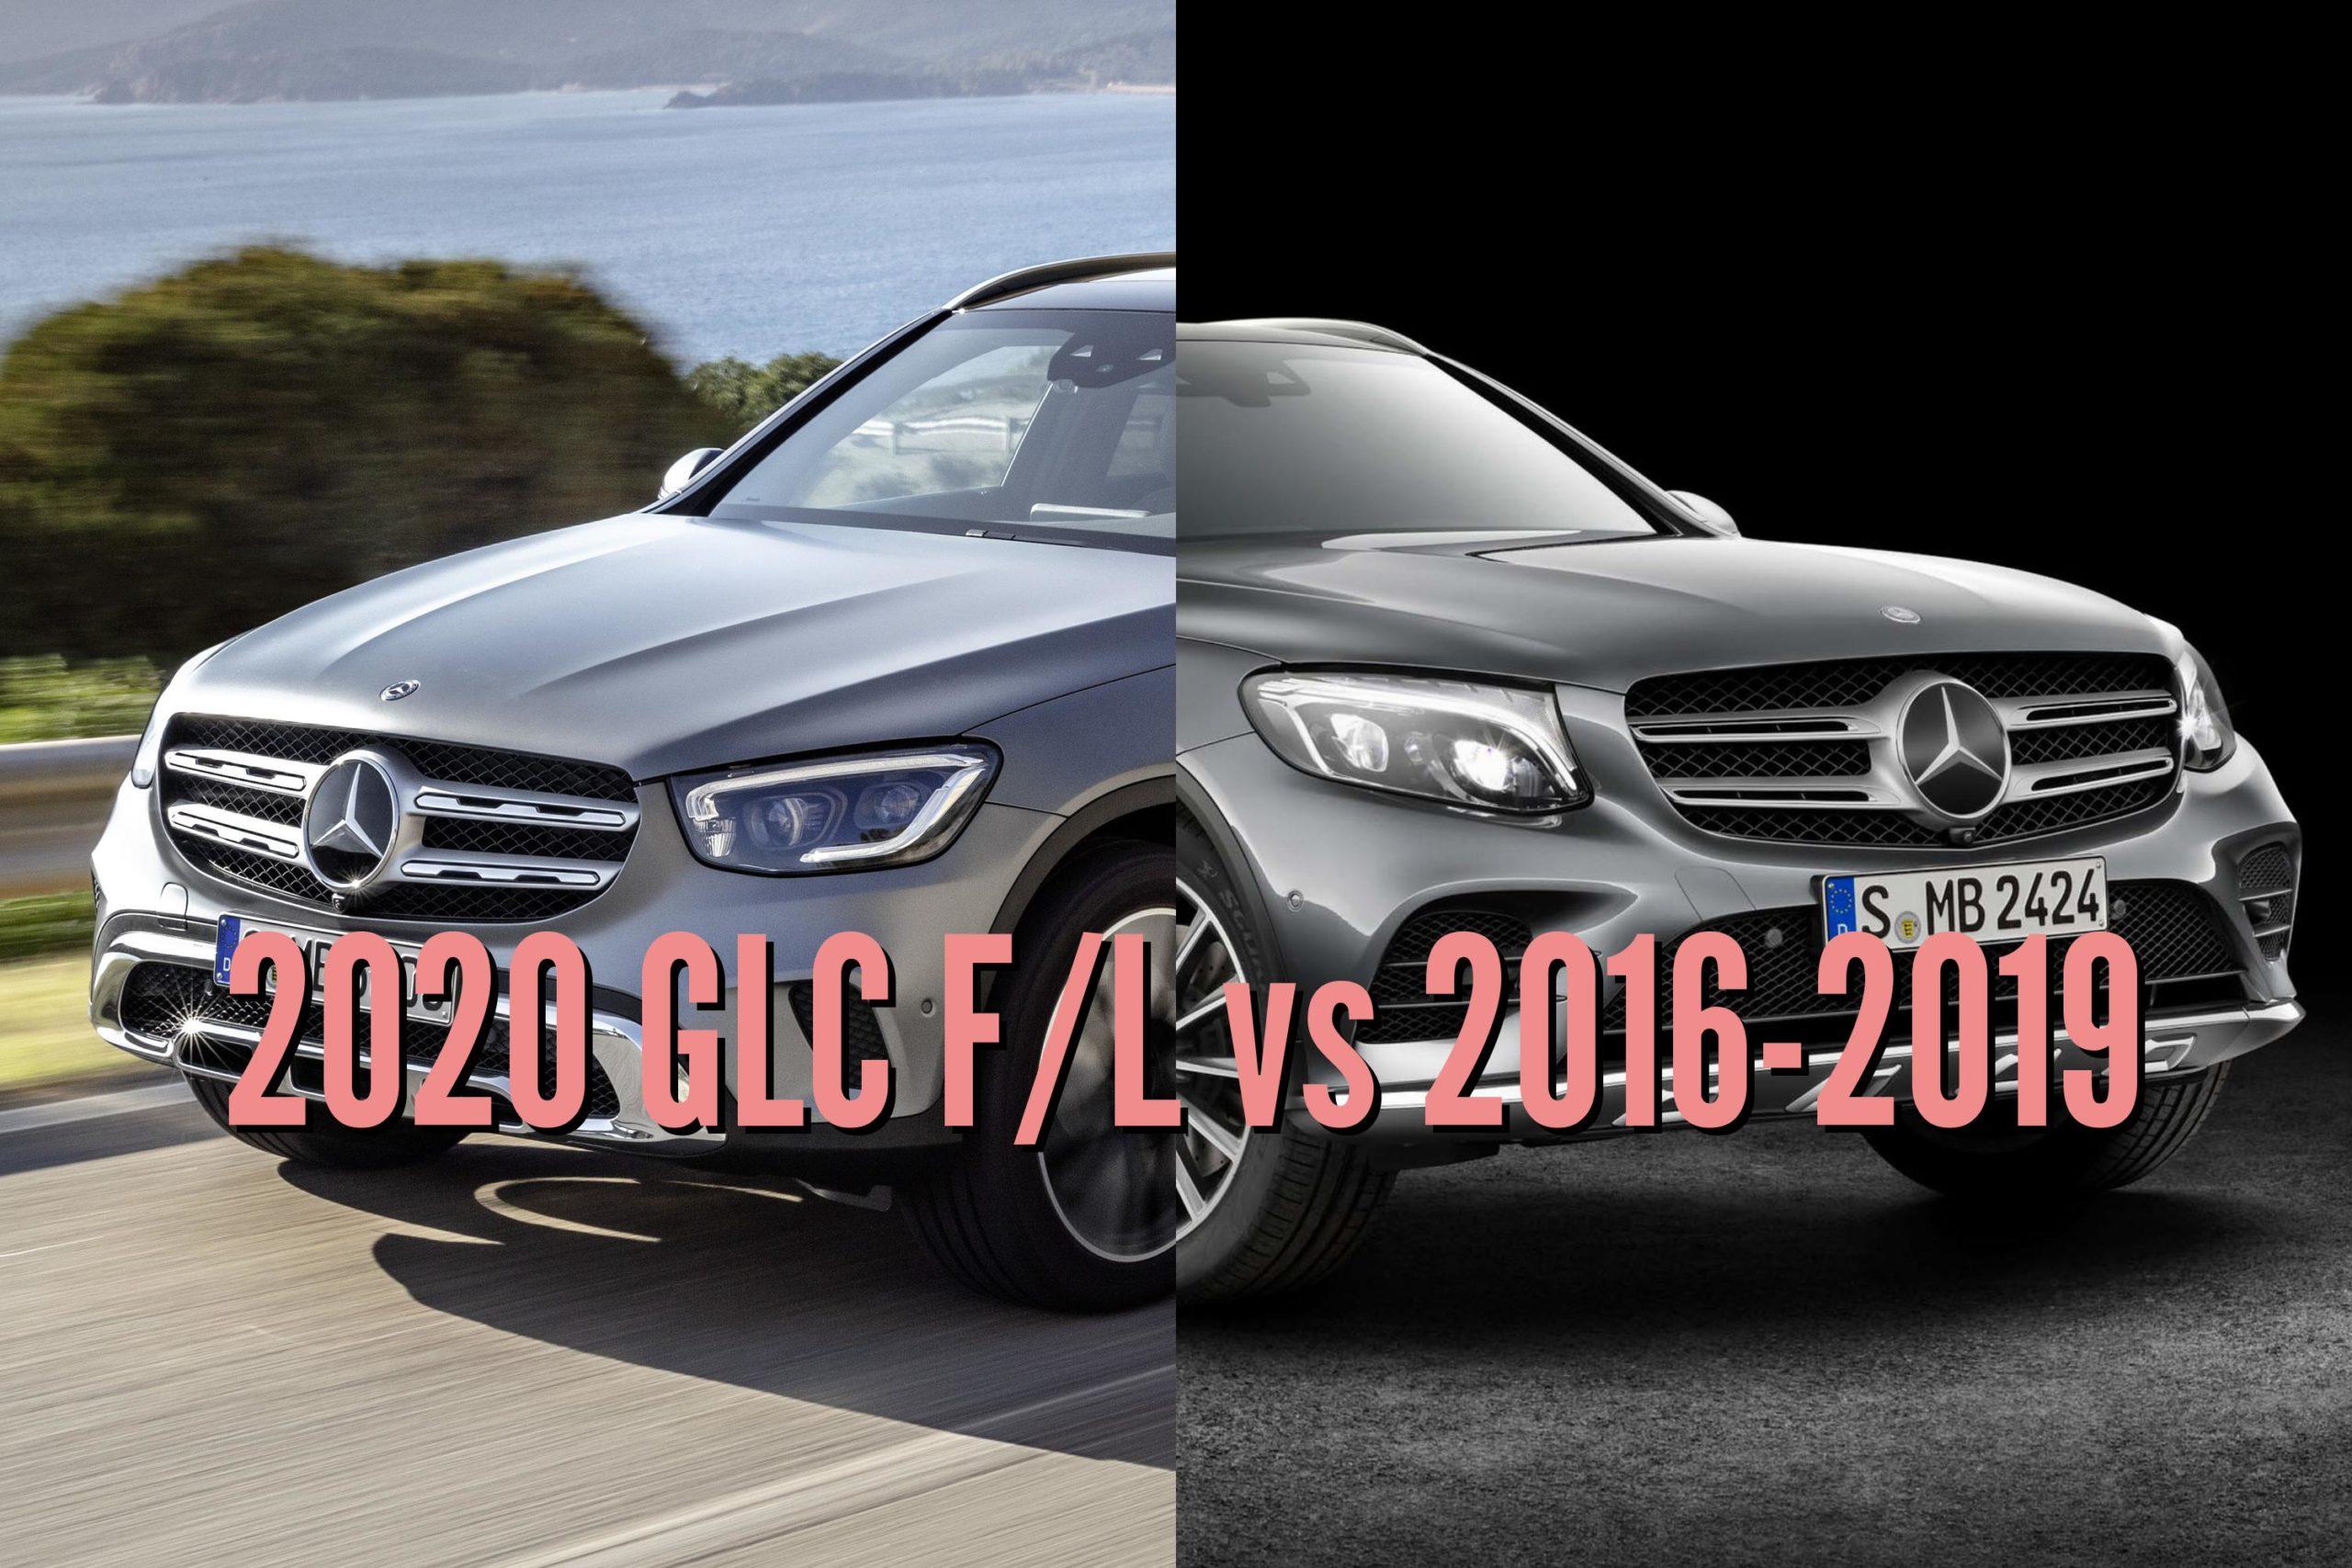 2020 Mercedes Benz Glc Vs 2016 2019 Facelift Changes Compared